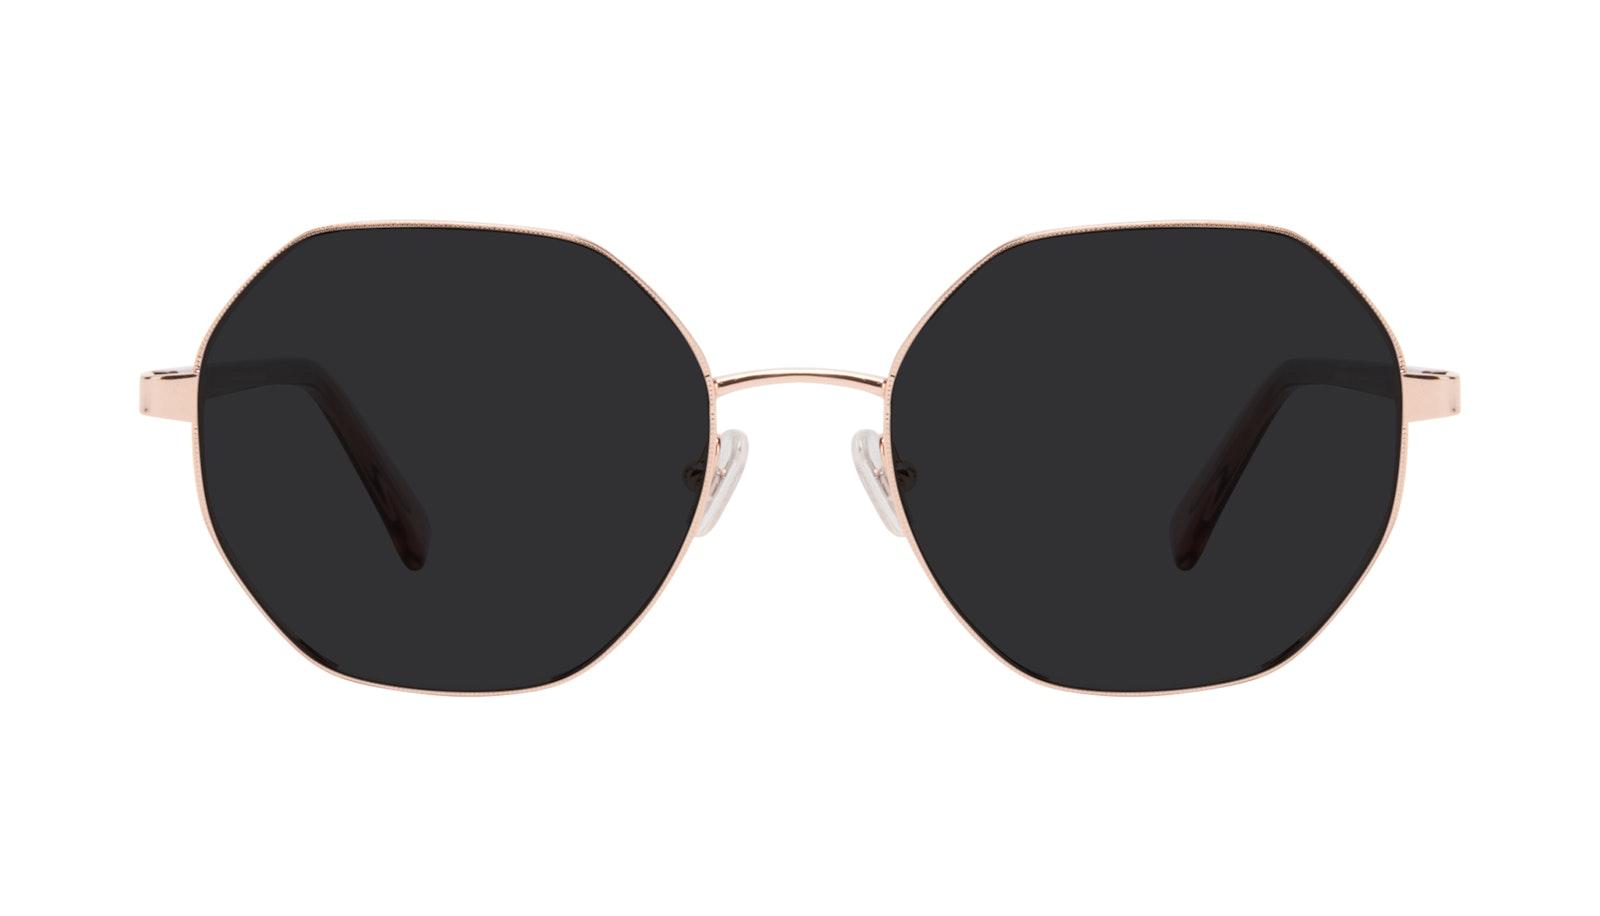 Affordable Fashion Glasses Round Sunglasses Women Fantasy Rose